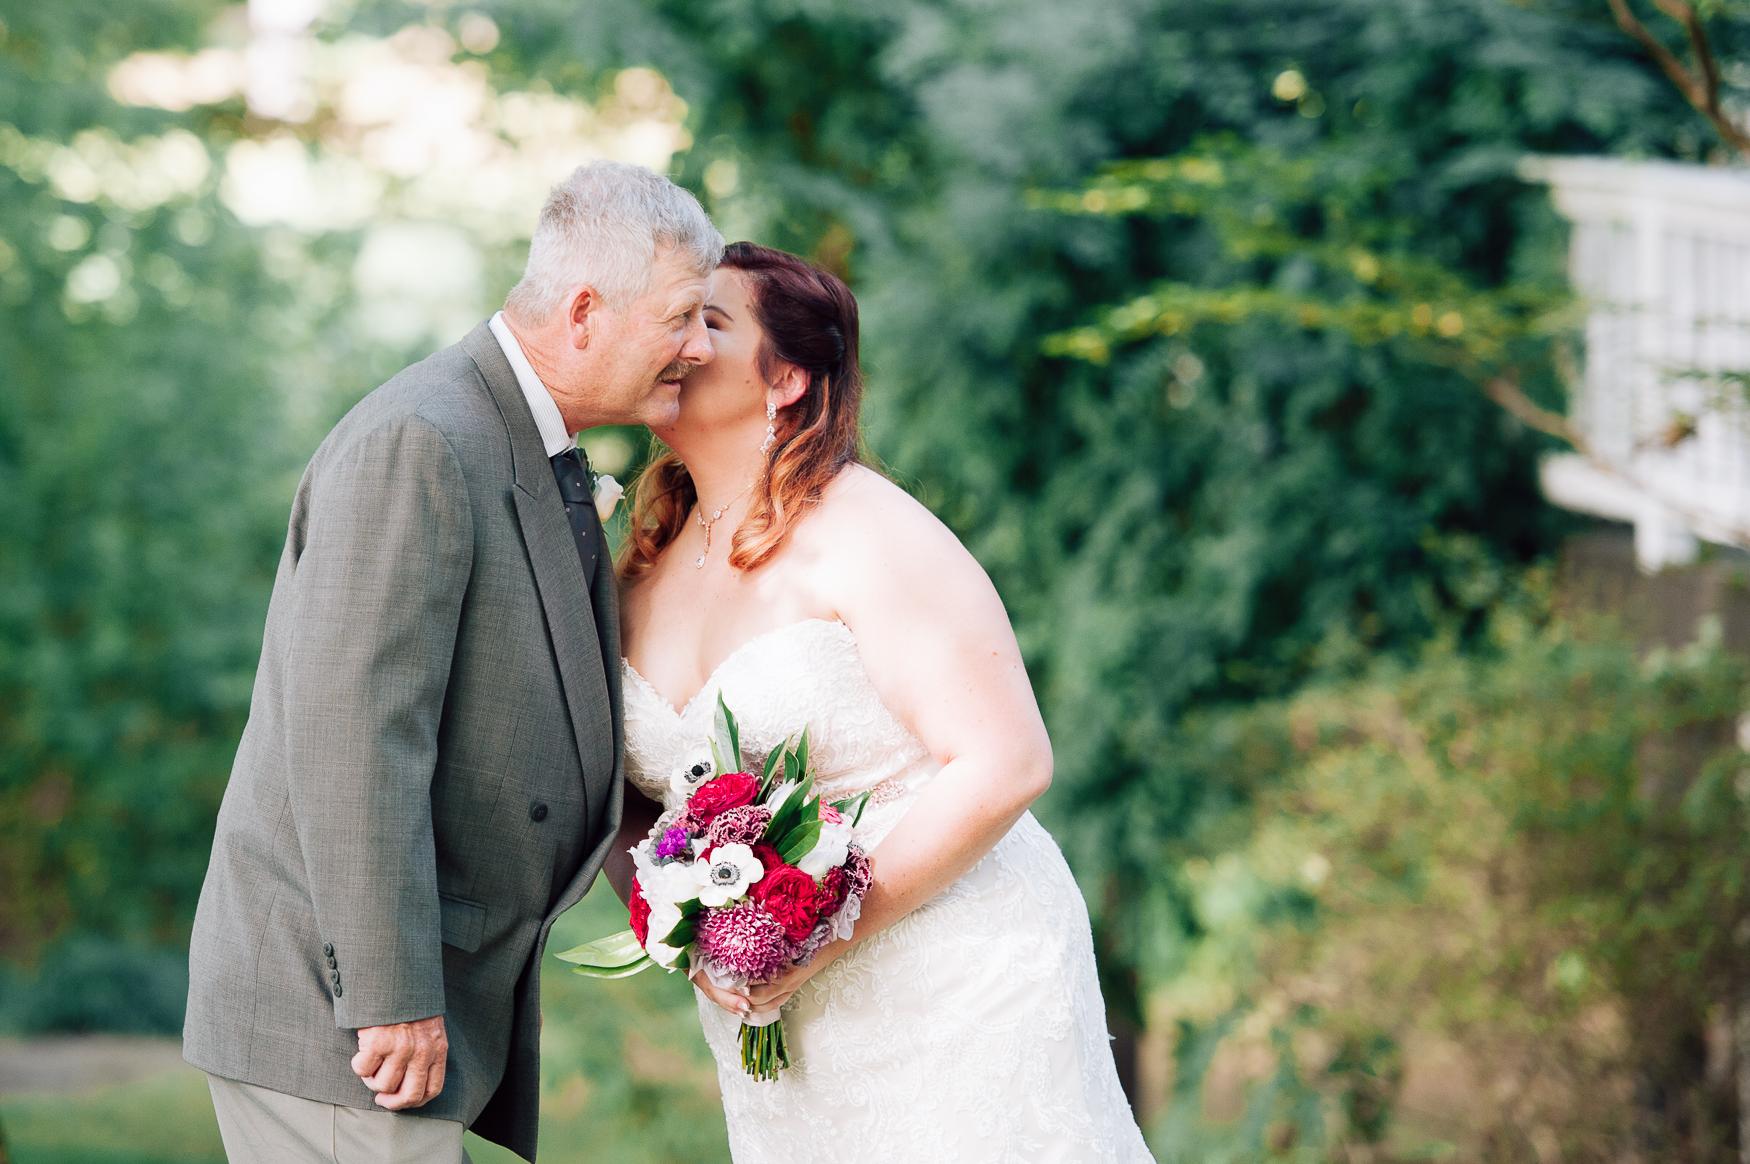 virginiawedding_GlenGarden_rusticwedding_fredericksburg_youseephotography_KellySteven (22).jpg